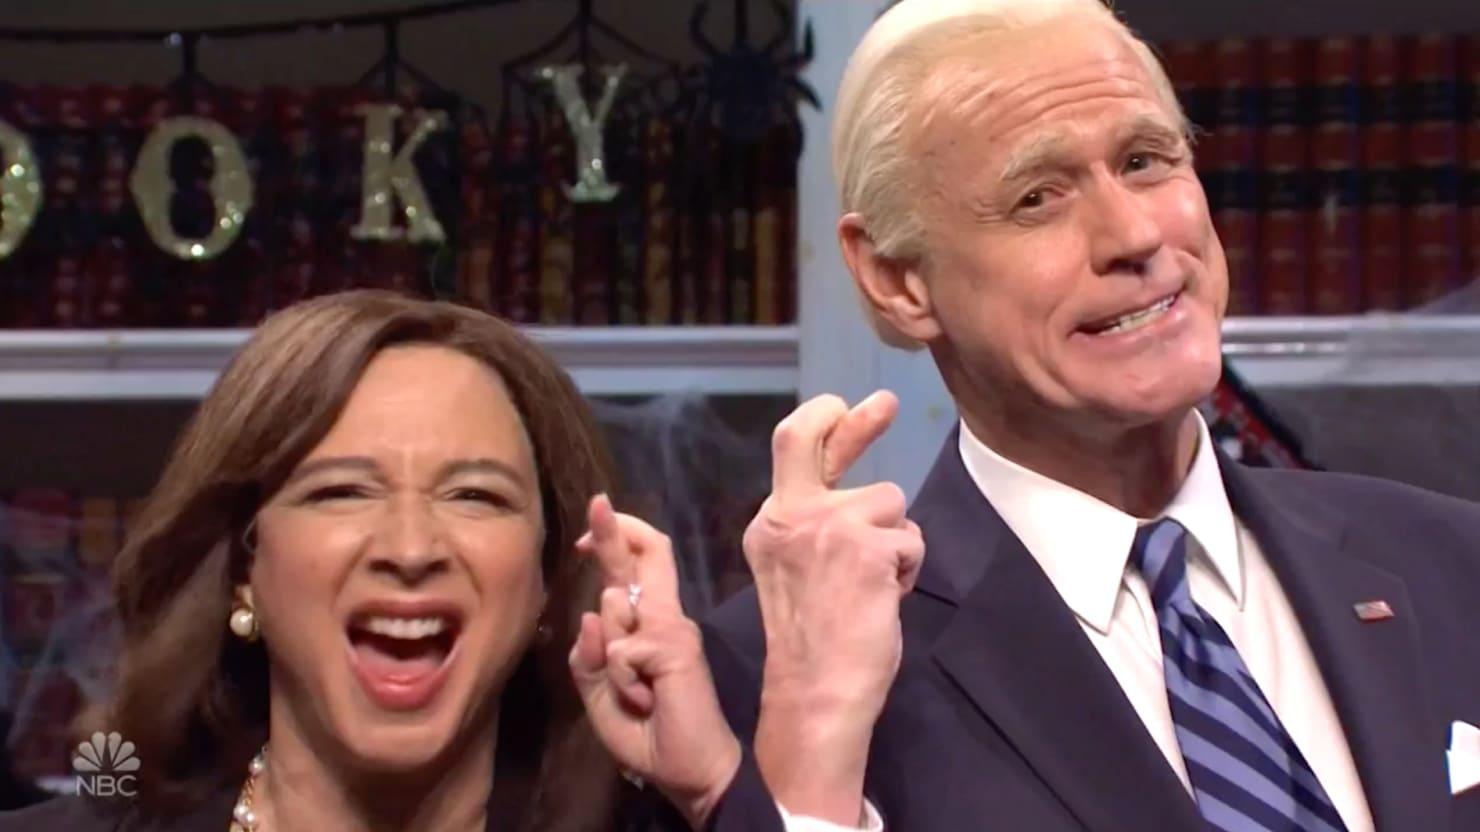 SNL Ditches Trump to Bet on a Joe Biden and Kamala Harris Victory